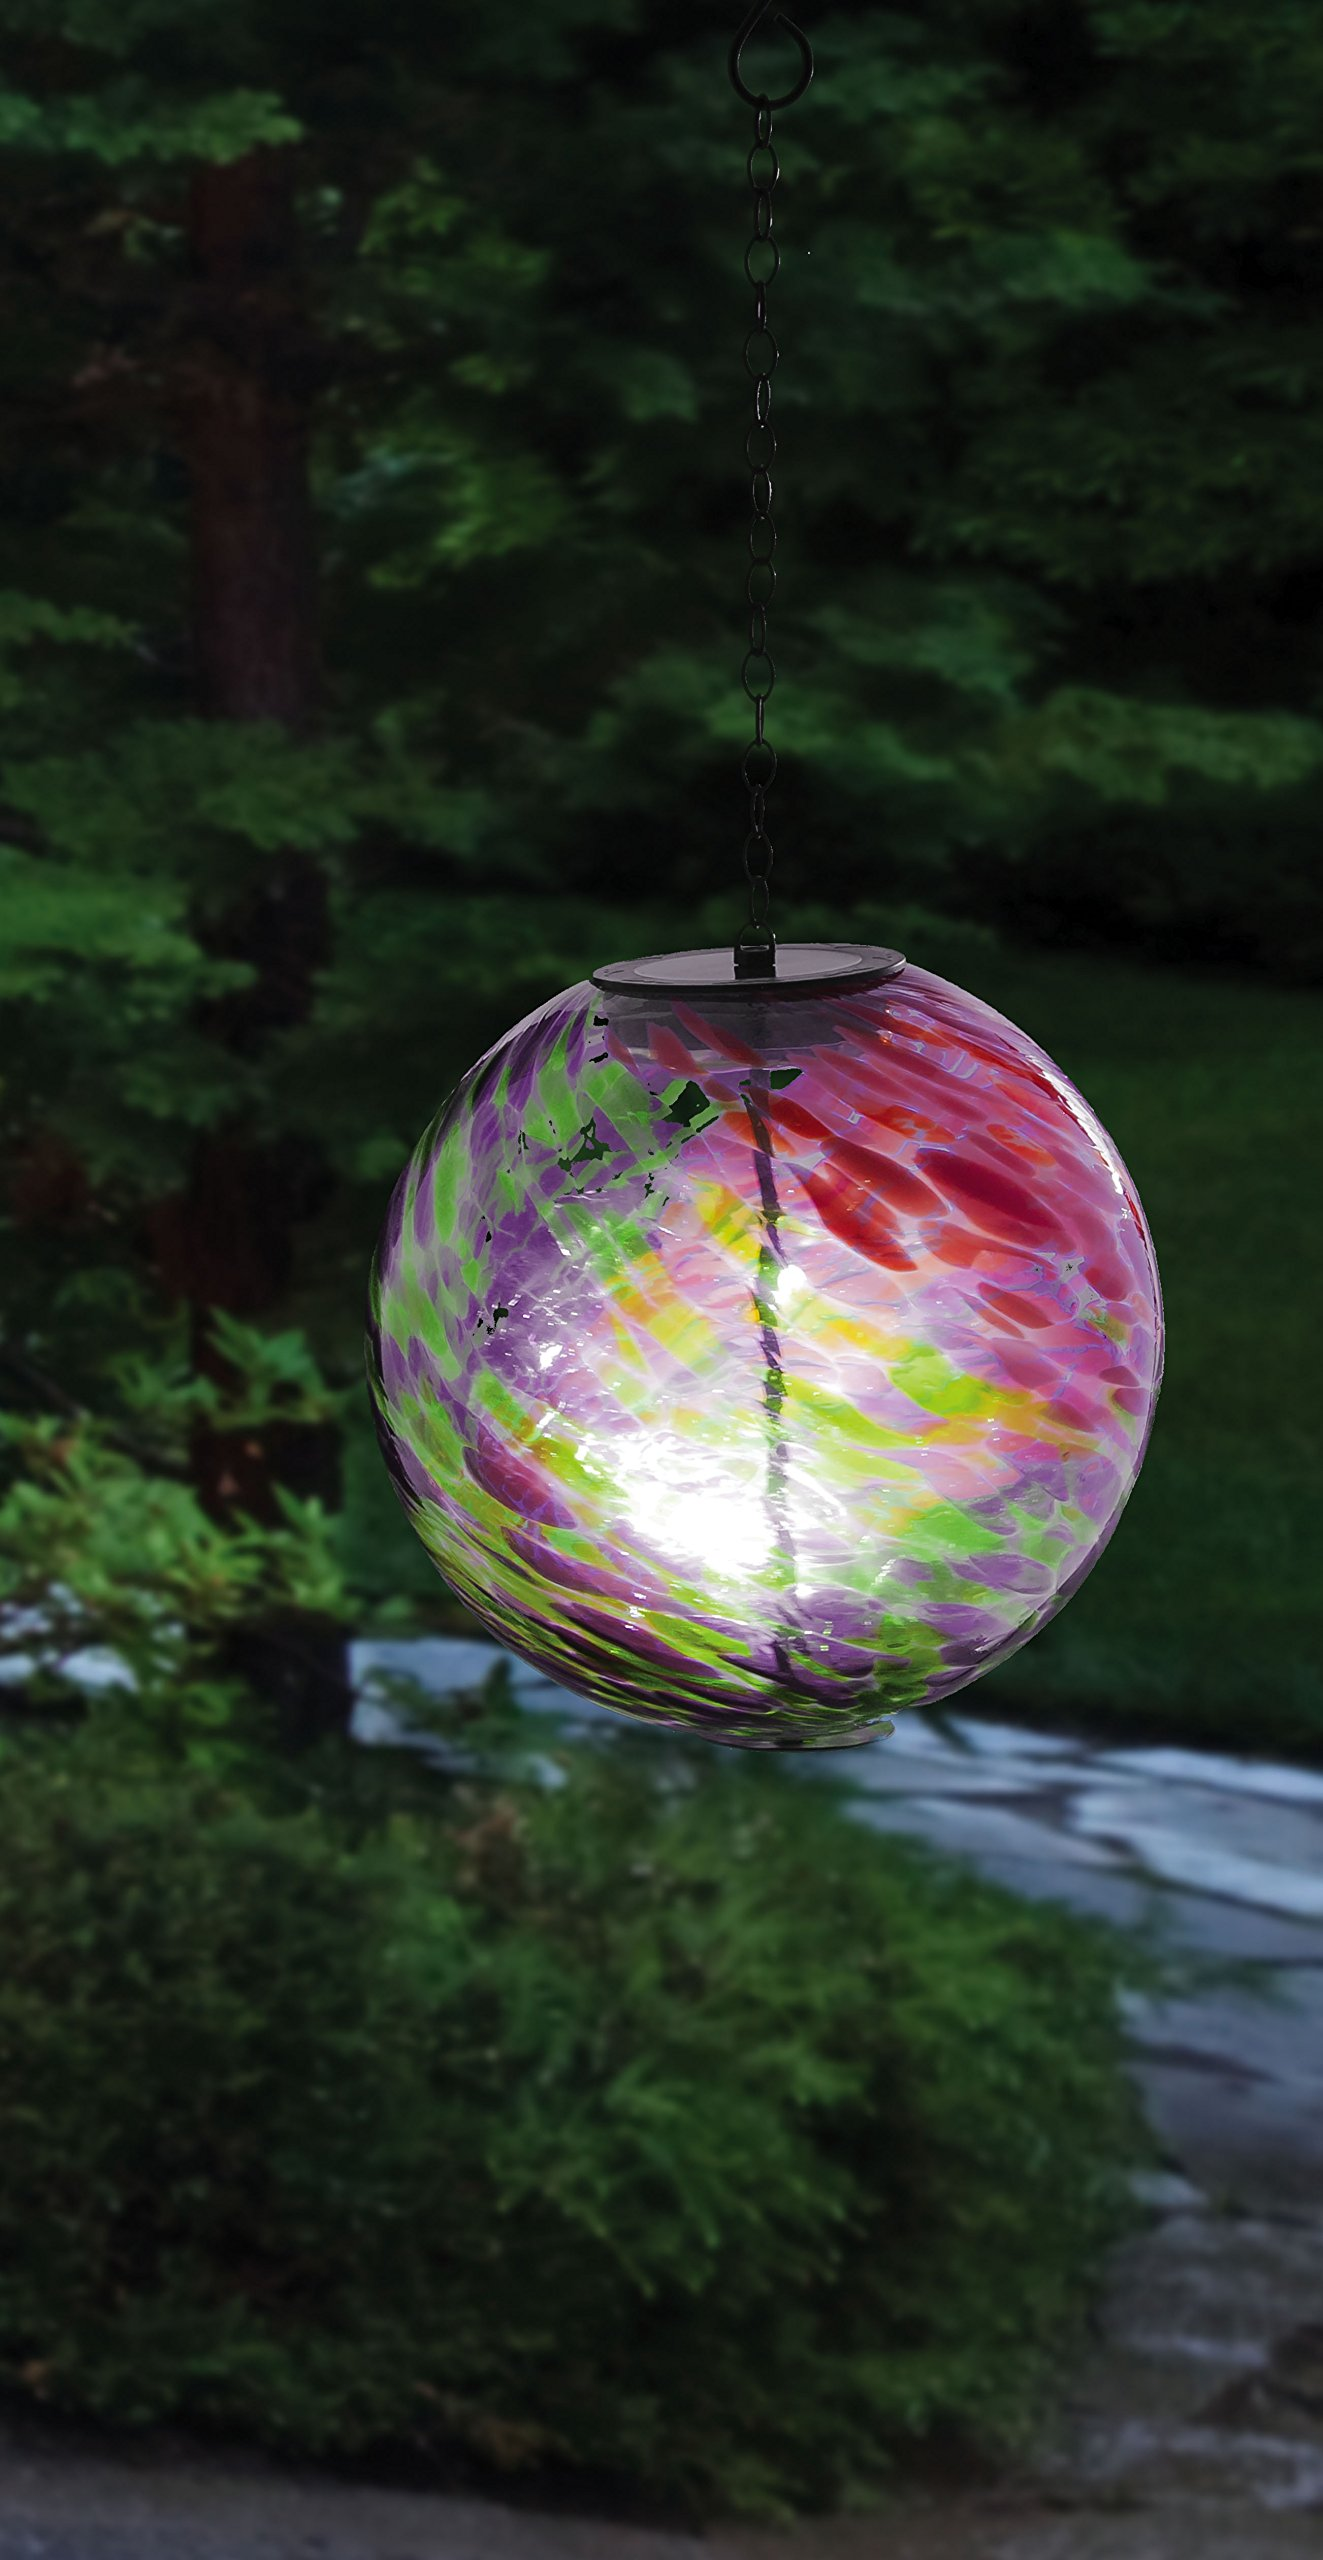 Evergreen Enterprises Hanging Solar Gazing Ball Outdoor Decor, Pink/Green